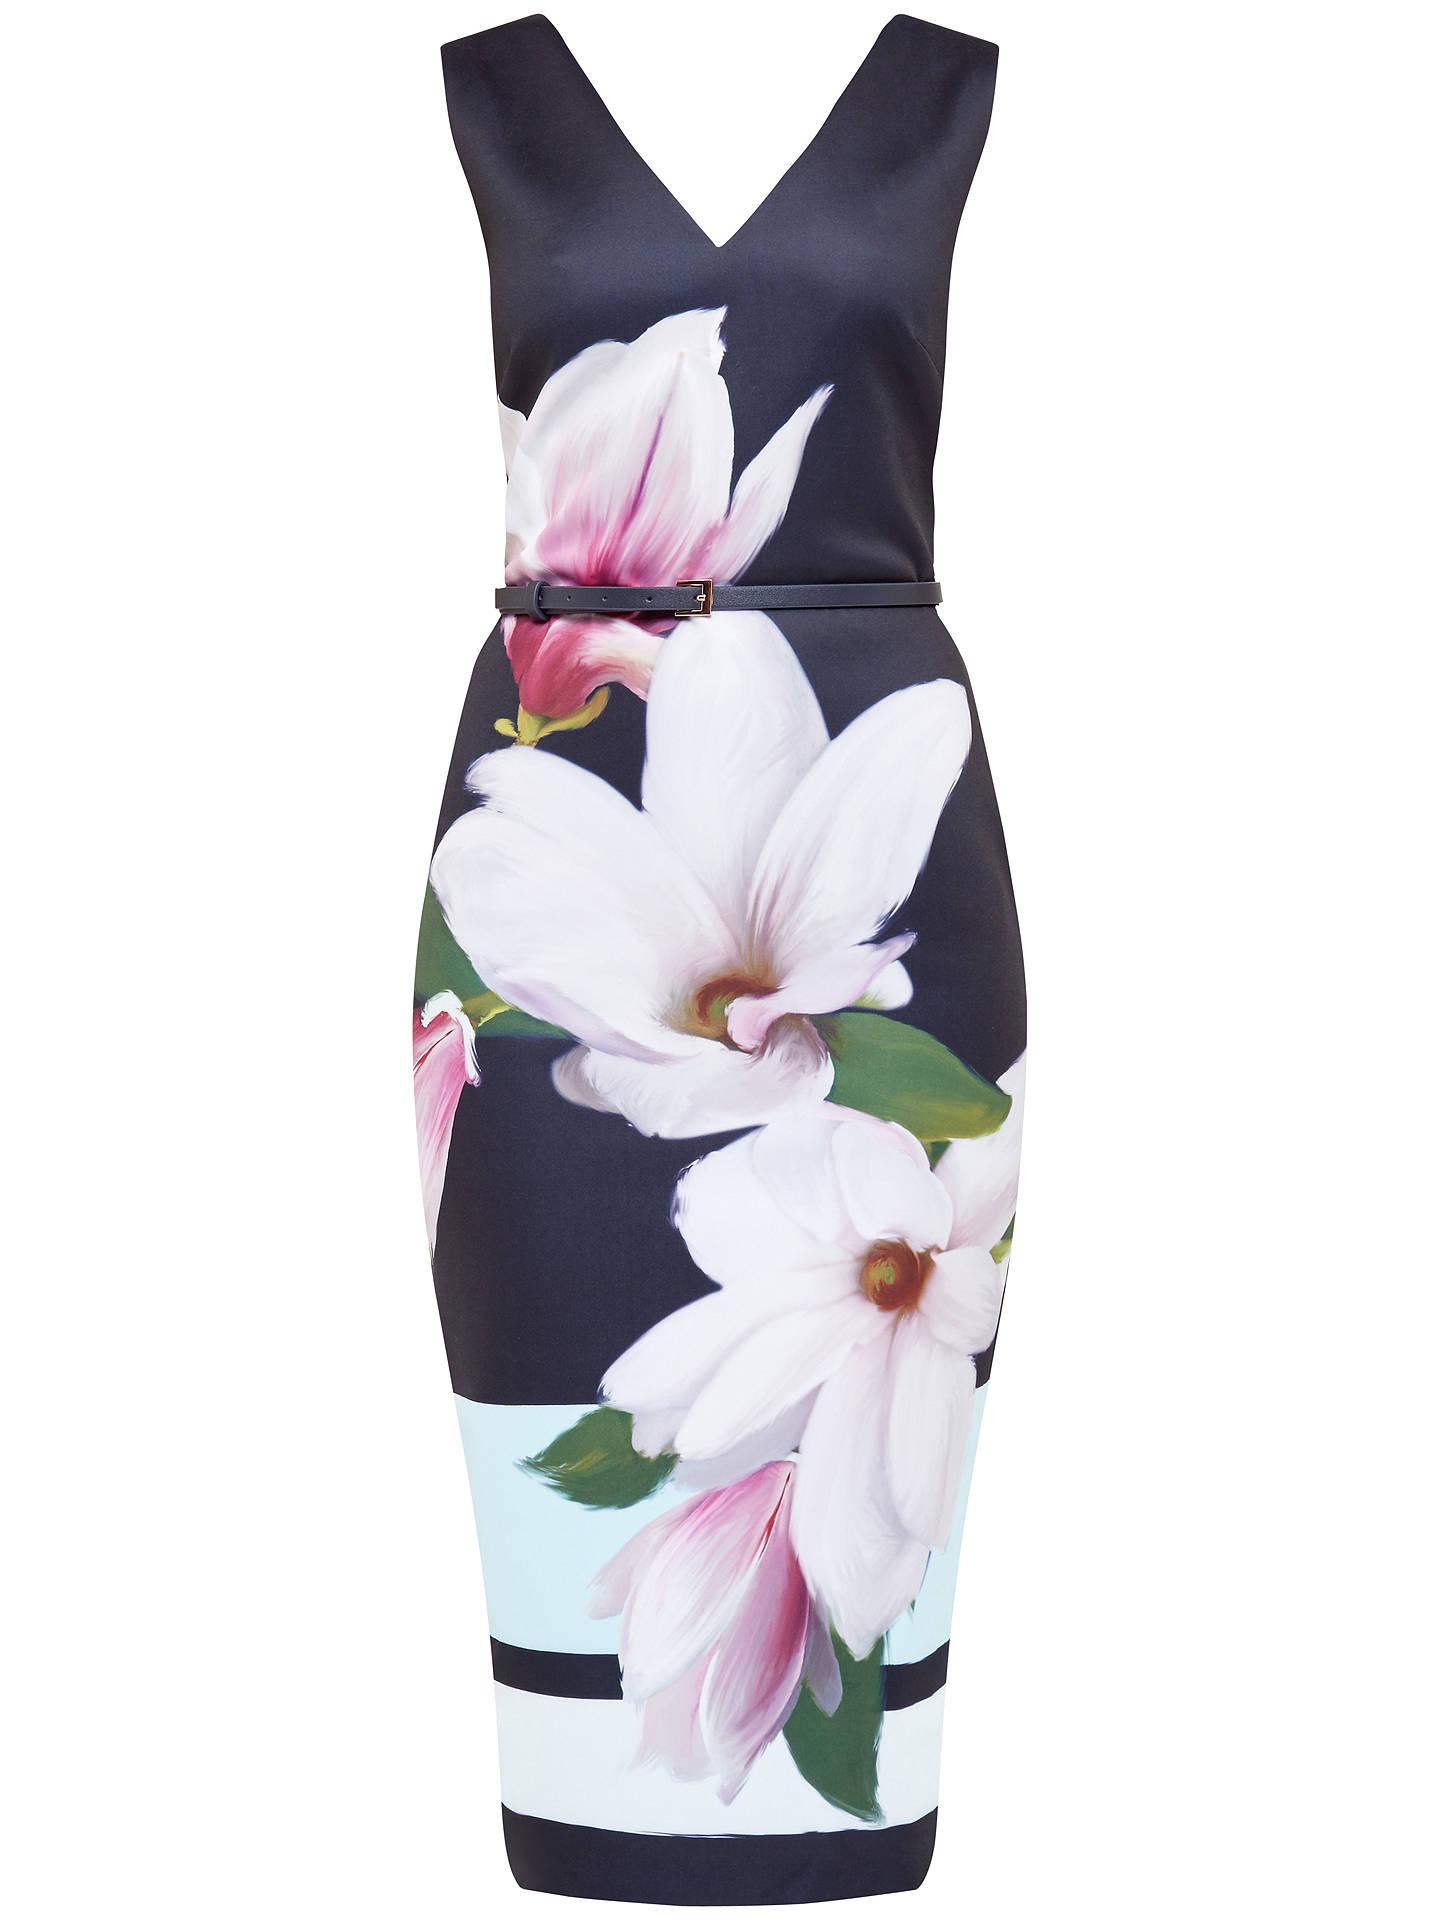 cfb1888bb50 Buy Ted Baker Magnolia Stripe Dress, Navy, 0 Online at johnlewis.com ...